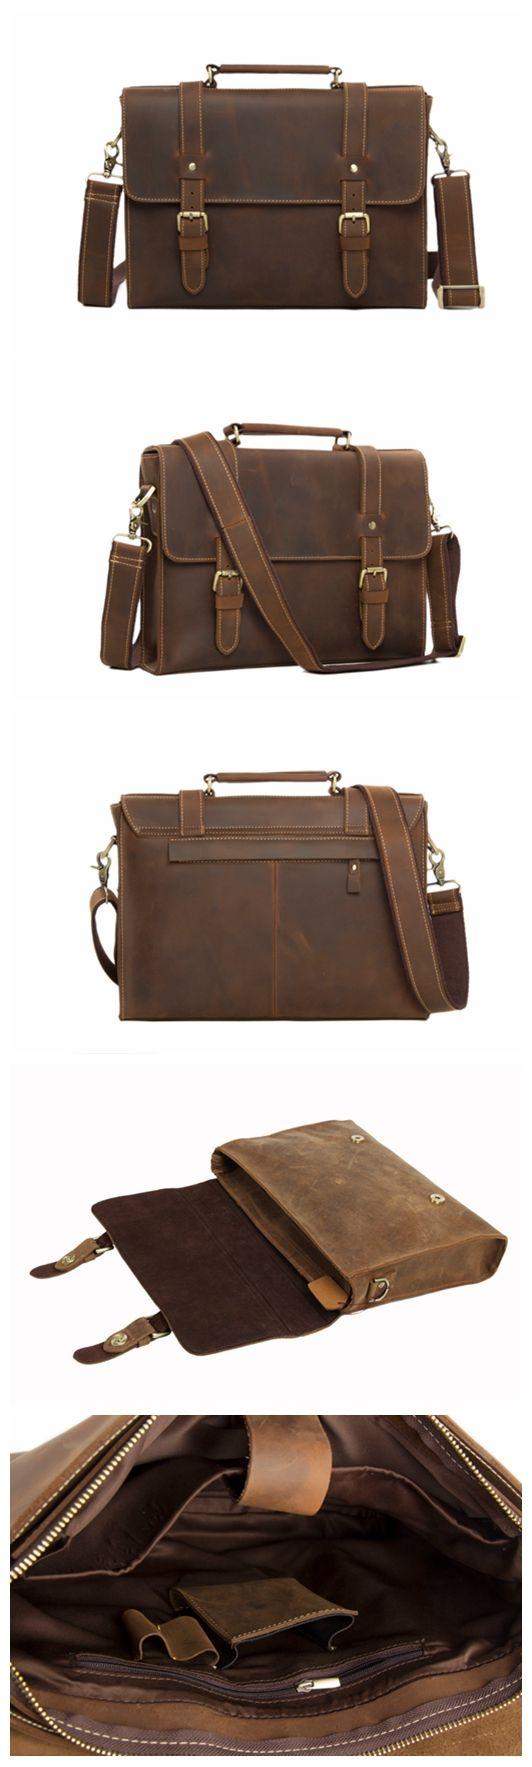 Handmade Vintage Style Leather Briefcase Messenger Bag Satchel Bag Crossbody…